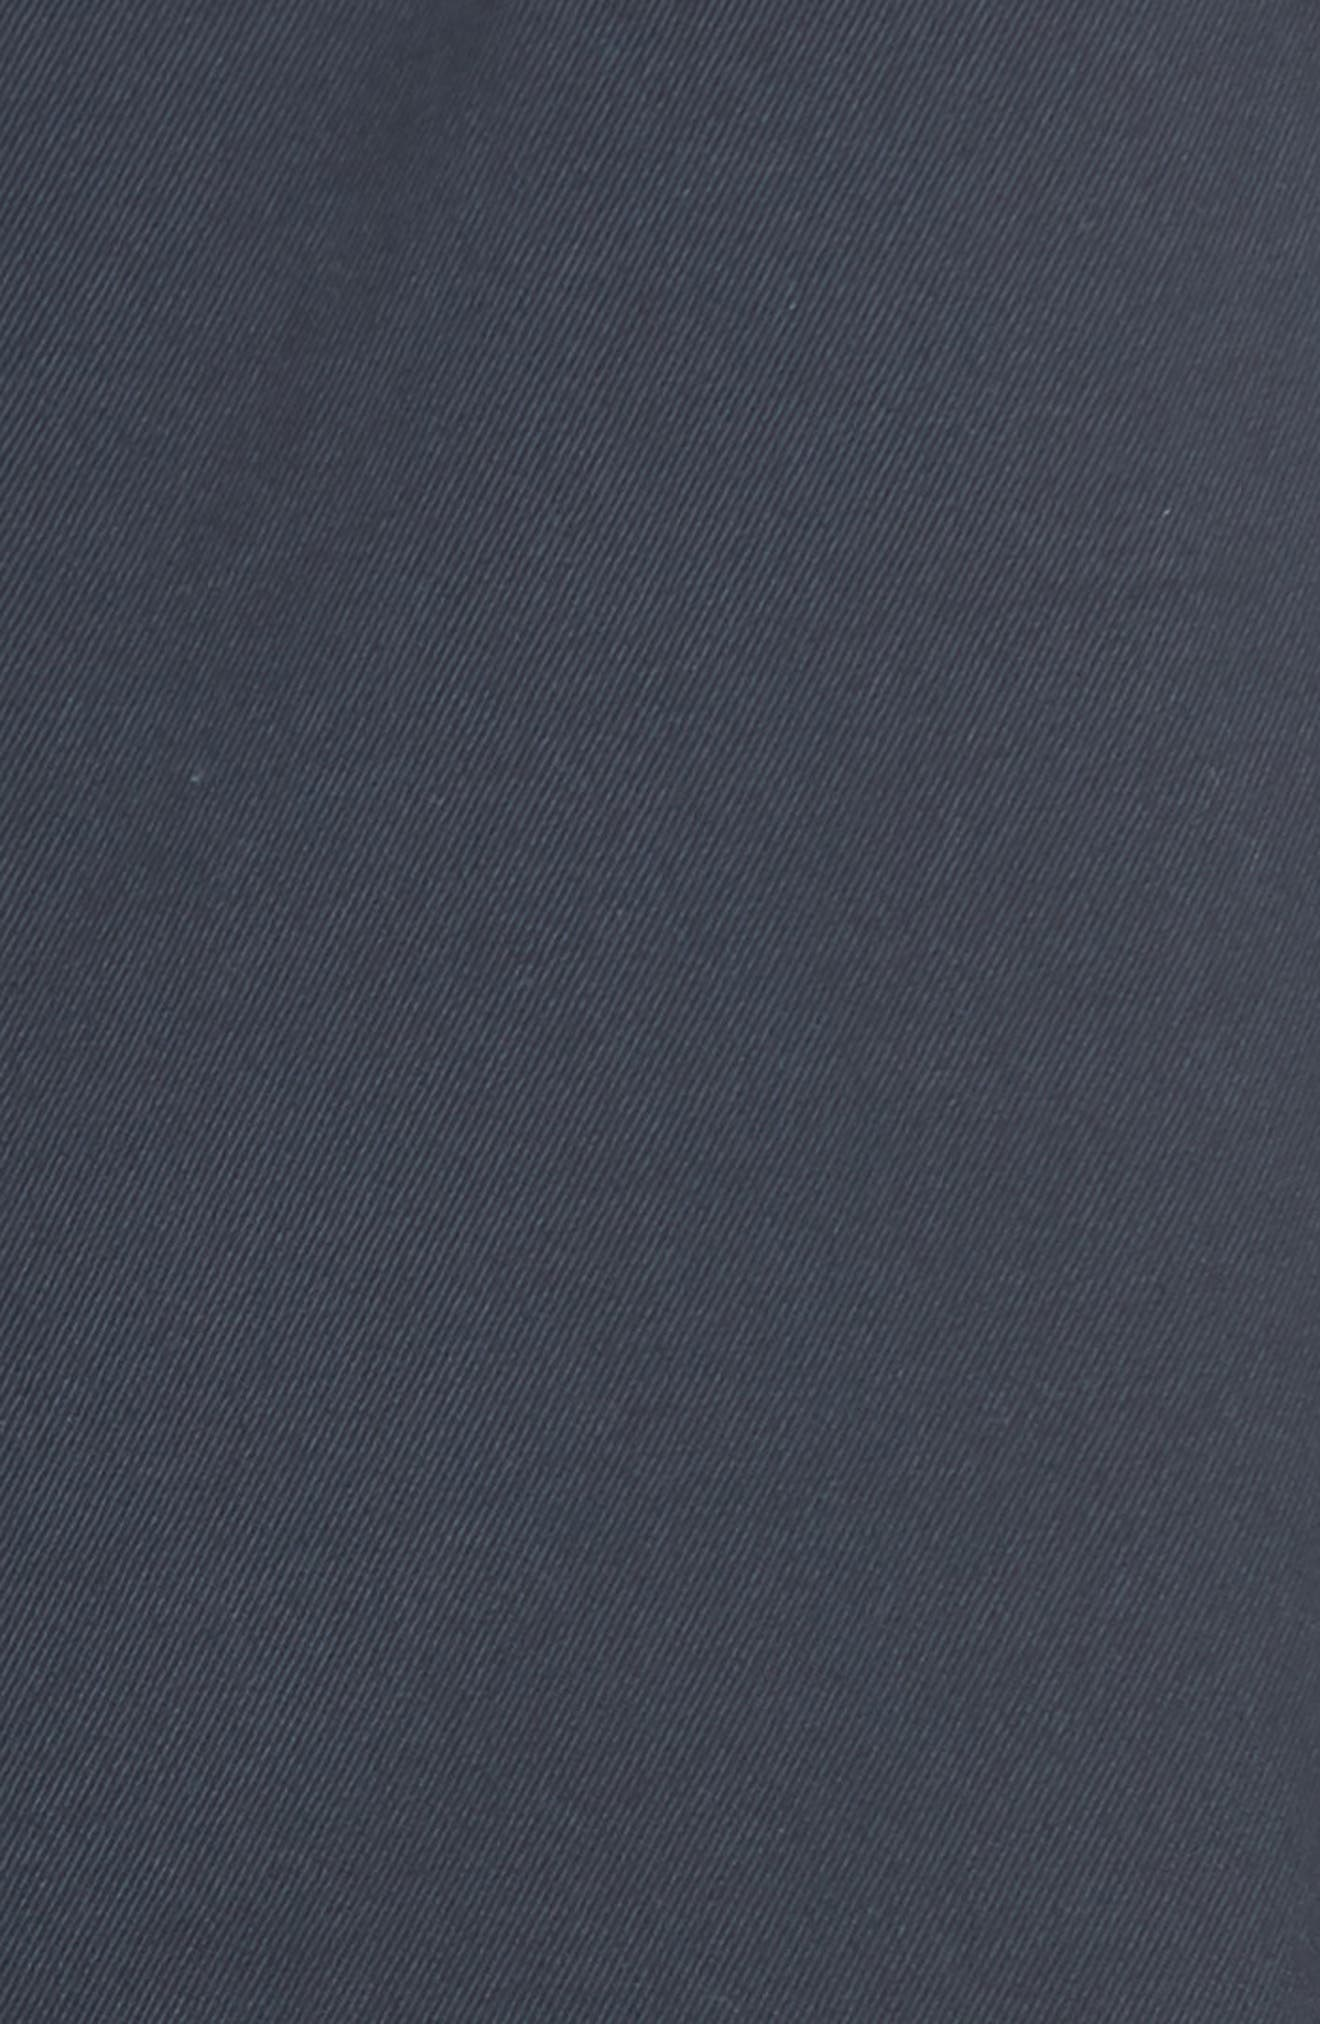 Ilene Crop Overalls,                             Alternate thumbnail 3, color,                             Sulfur Dark Cove